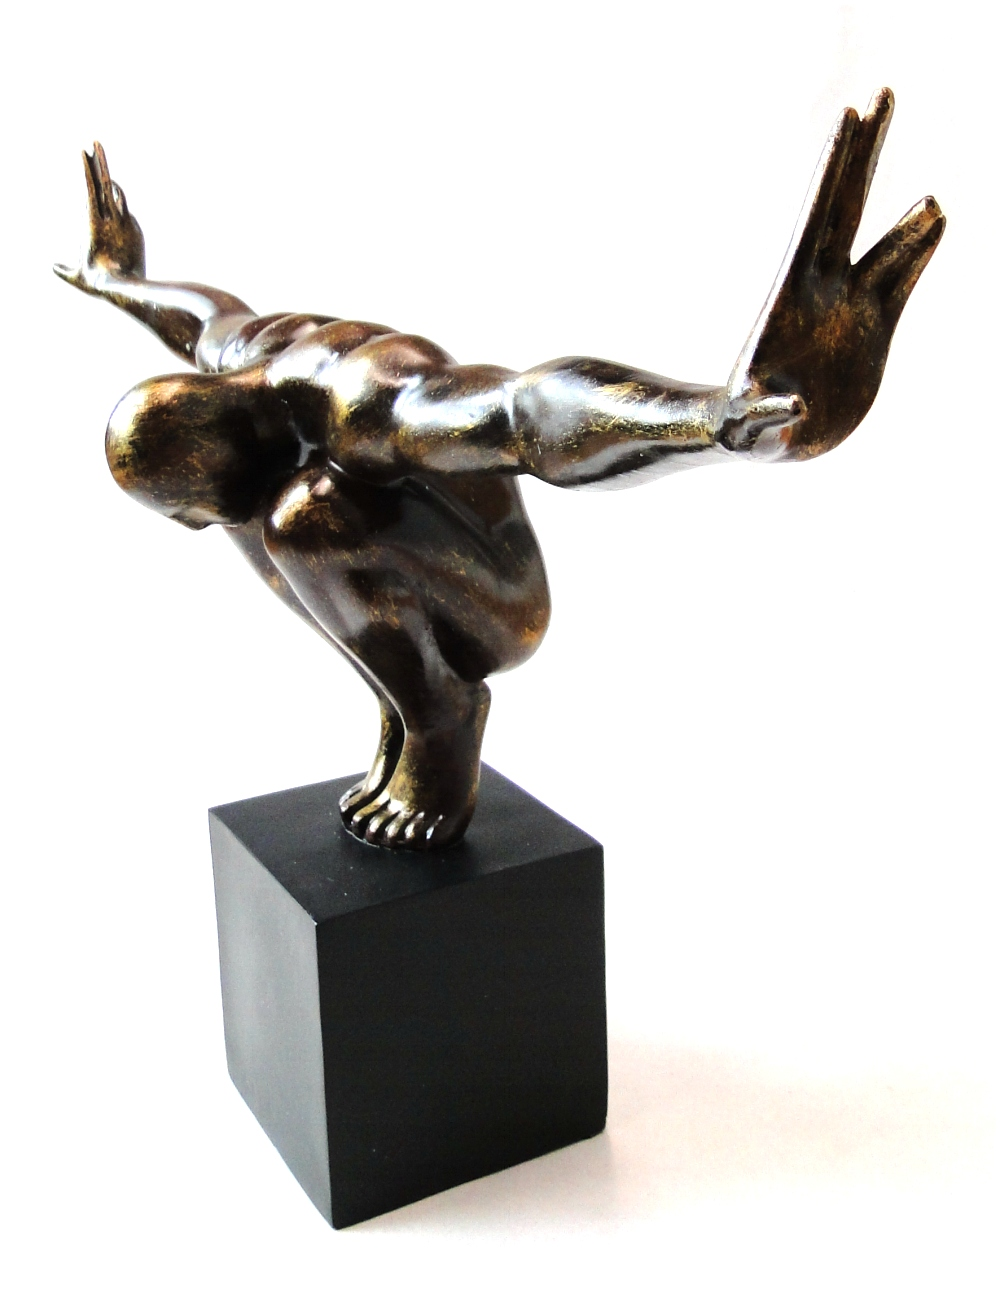 Human Form Statue Art in Faux Bronze - Statue Sculpture on Black ...